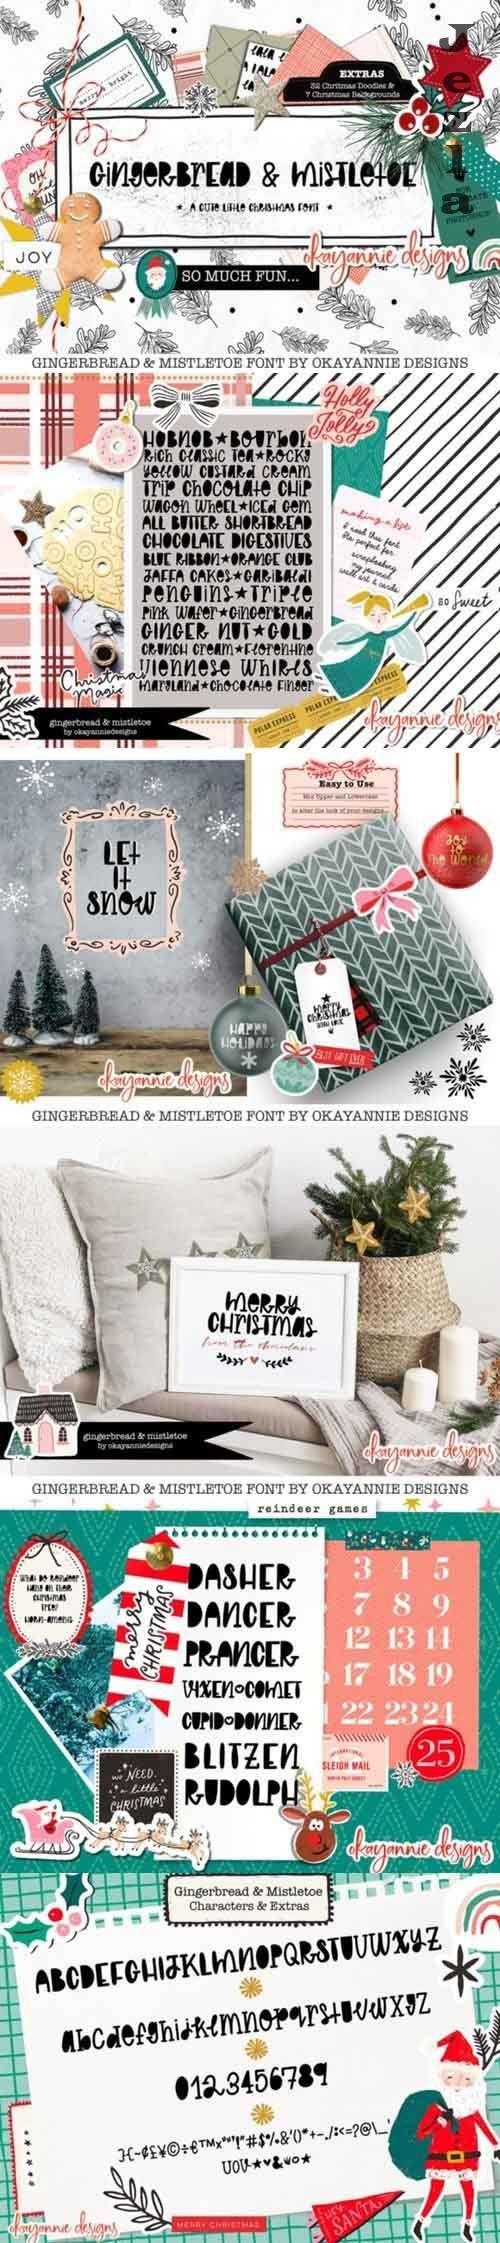 GingerBread & Mistletoe Font&Extras - 5650614